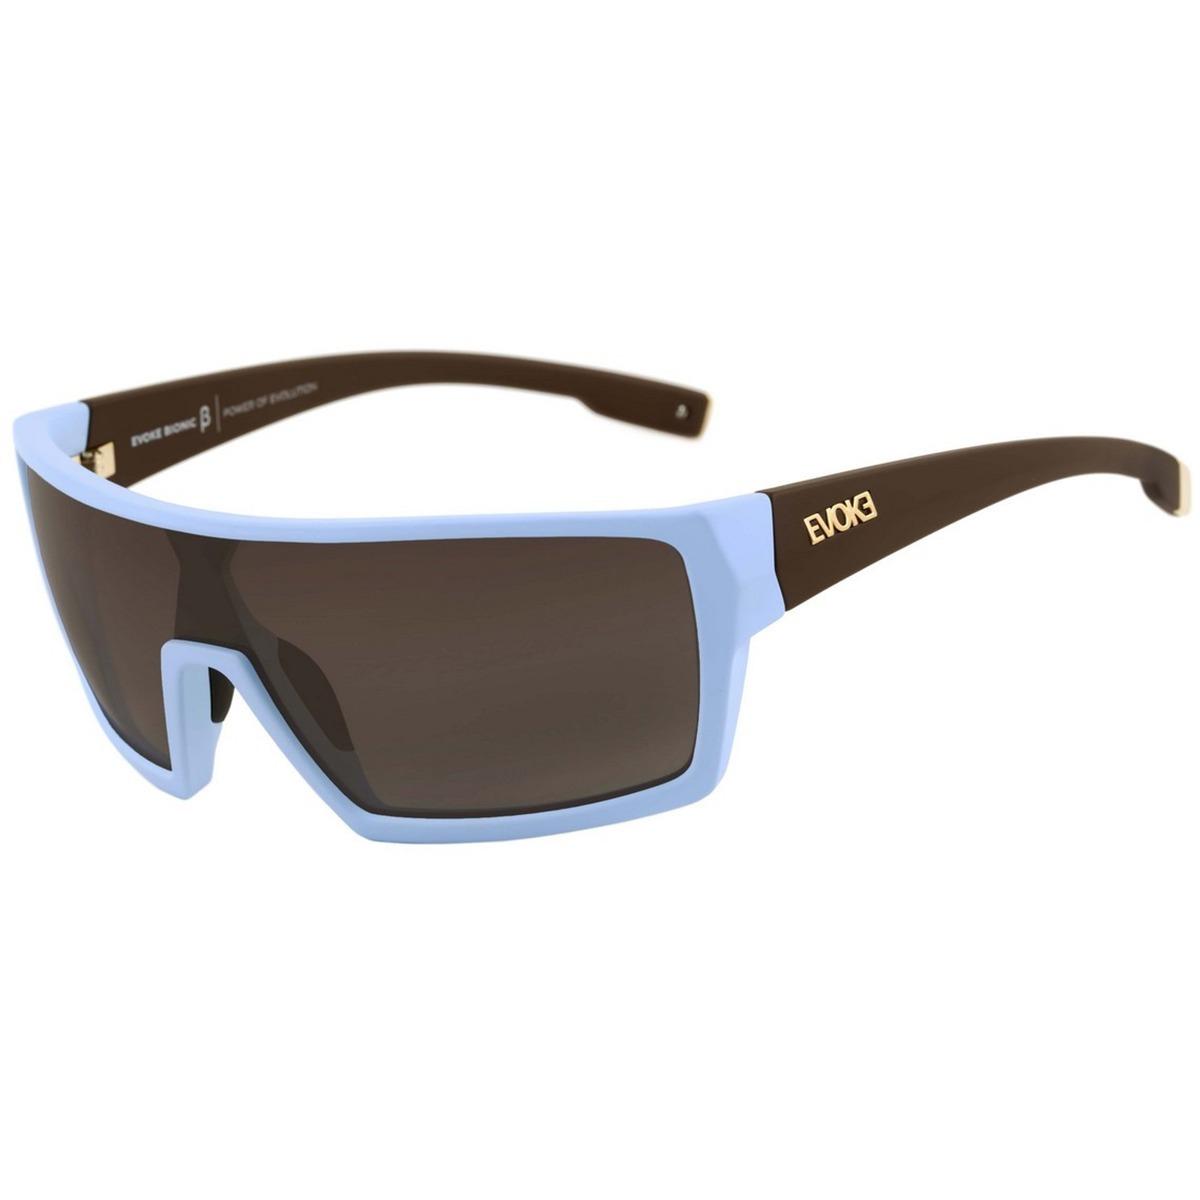 ae98cd02bdf74 Oculos Sol Evoke Bionic Beta D04t Azul Marrom Gold Original - R  470 ...